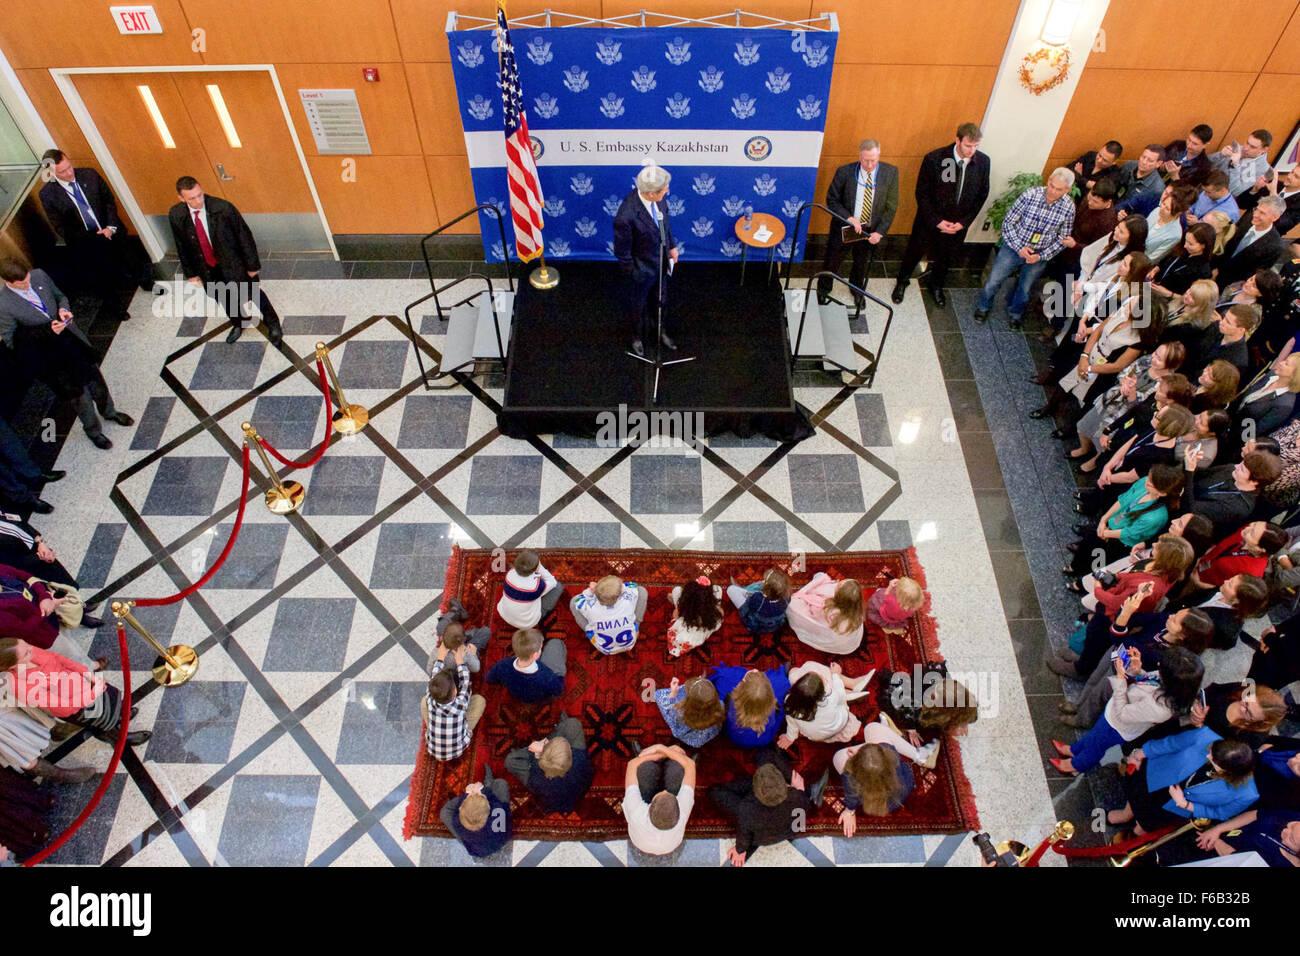 Secretary Kerry Addresses Parents and Kids at a Meet and Greet at U.S. Embassy Astana - Stock Image